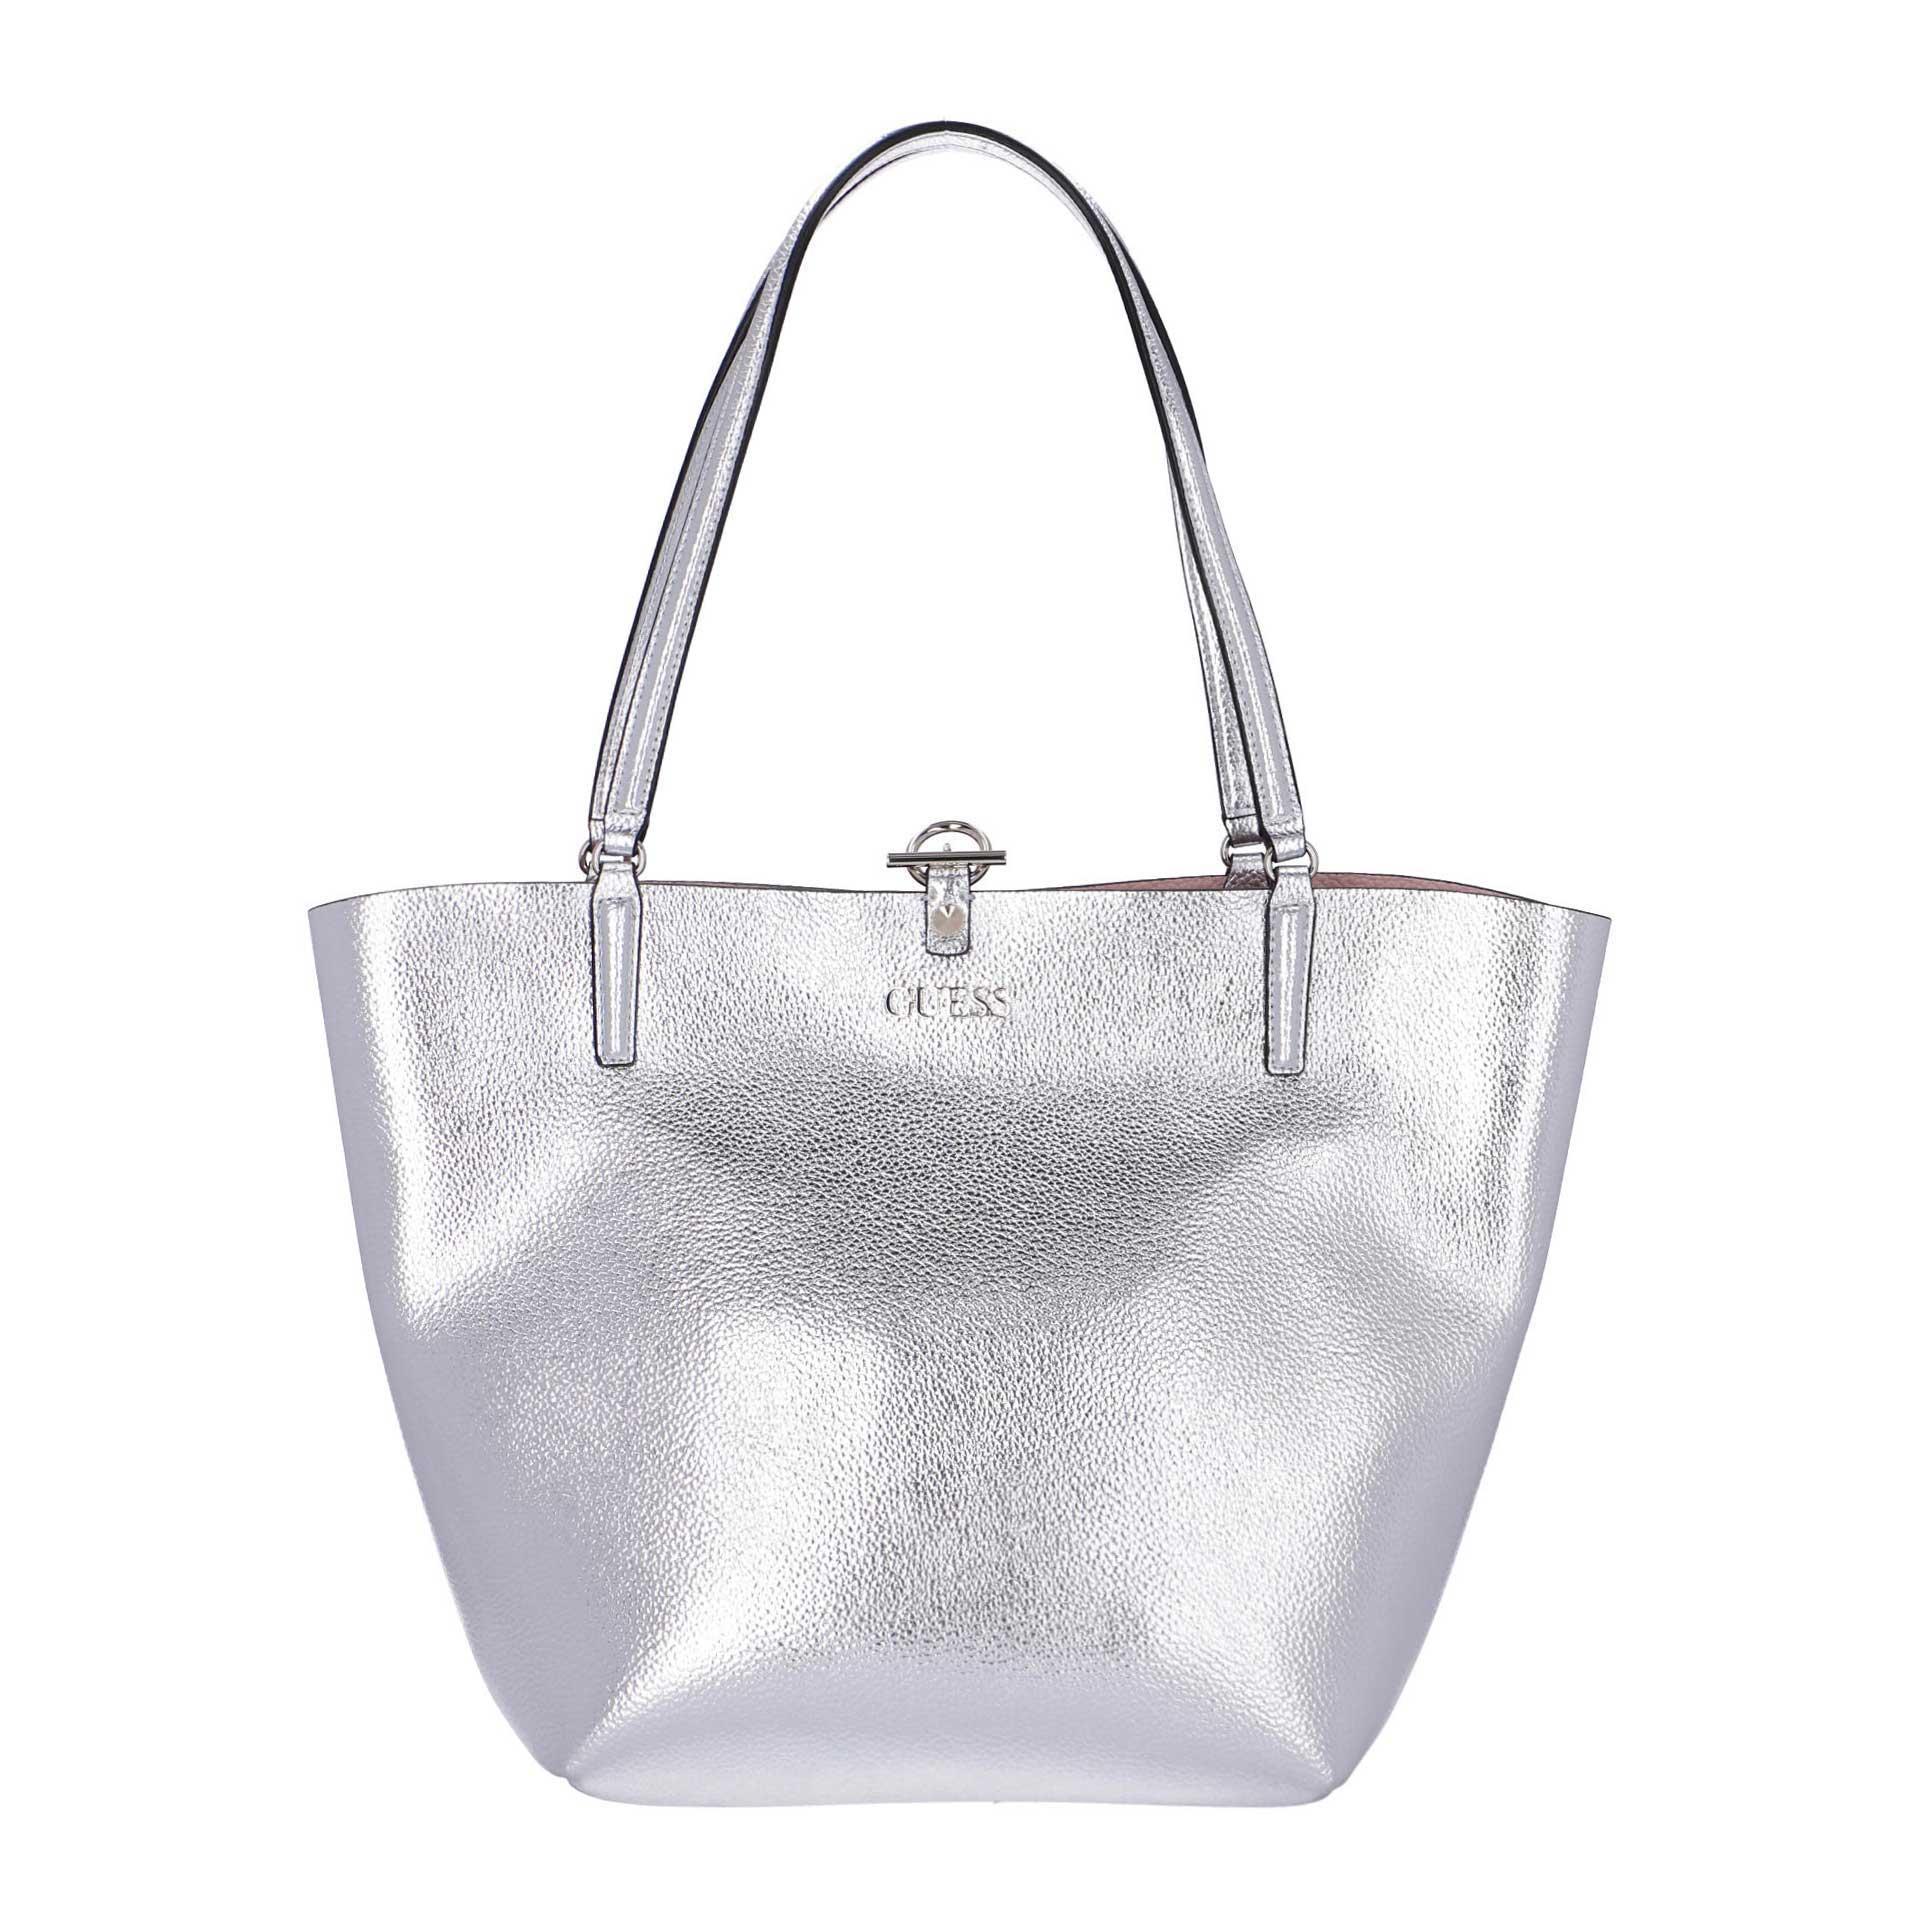 Guess Alby Wende-Shopper mit herausnehmbarer Clutch silver blush